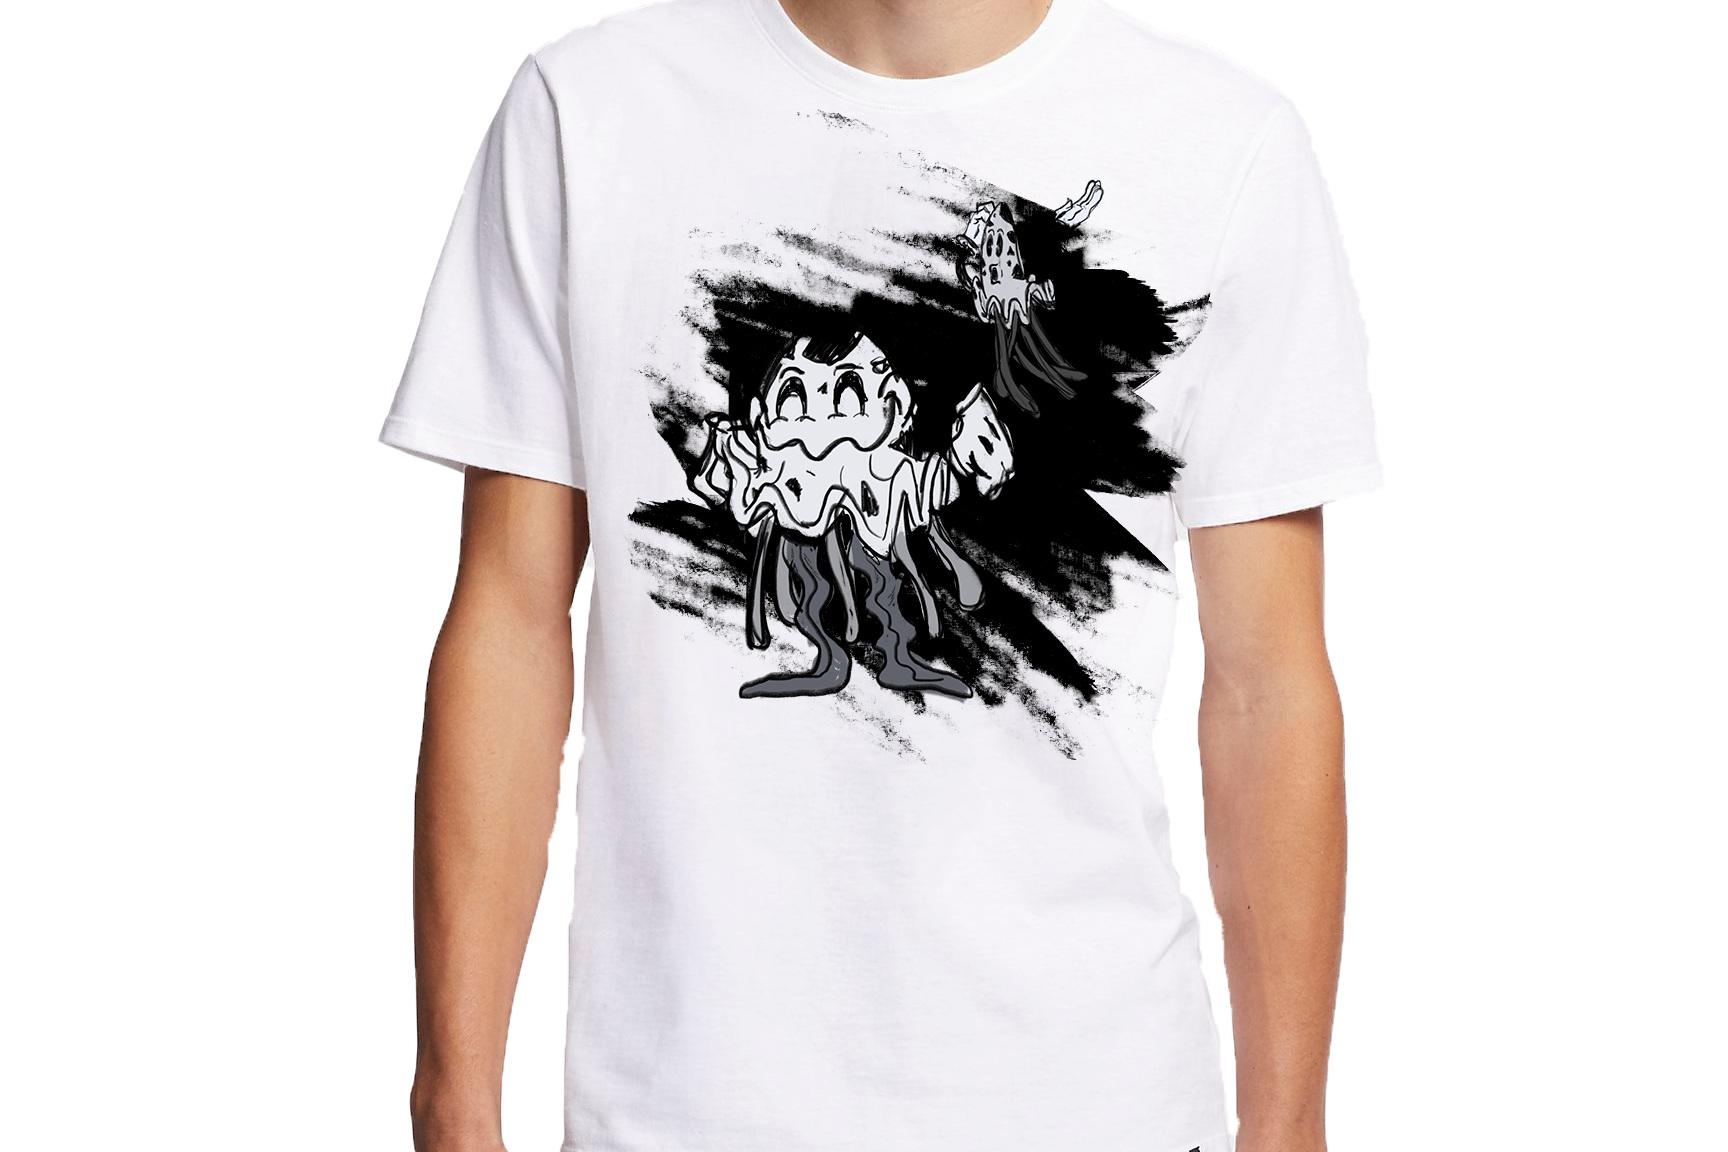 hurley-honu-men's-t-shirt-qpw3Q3 (1).png